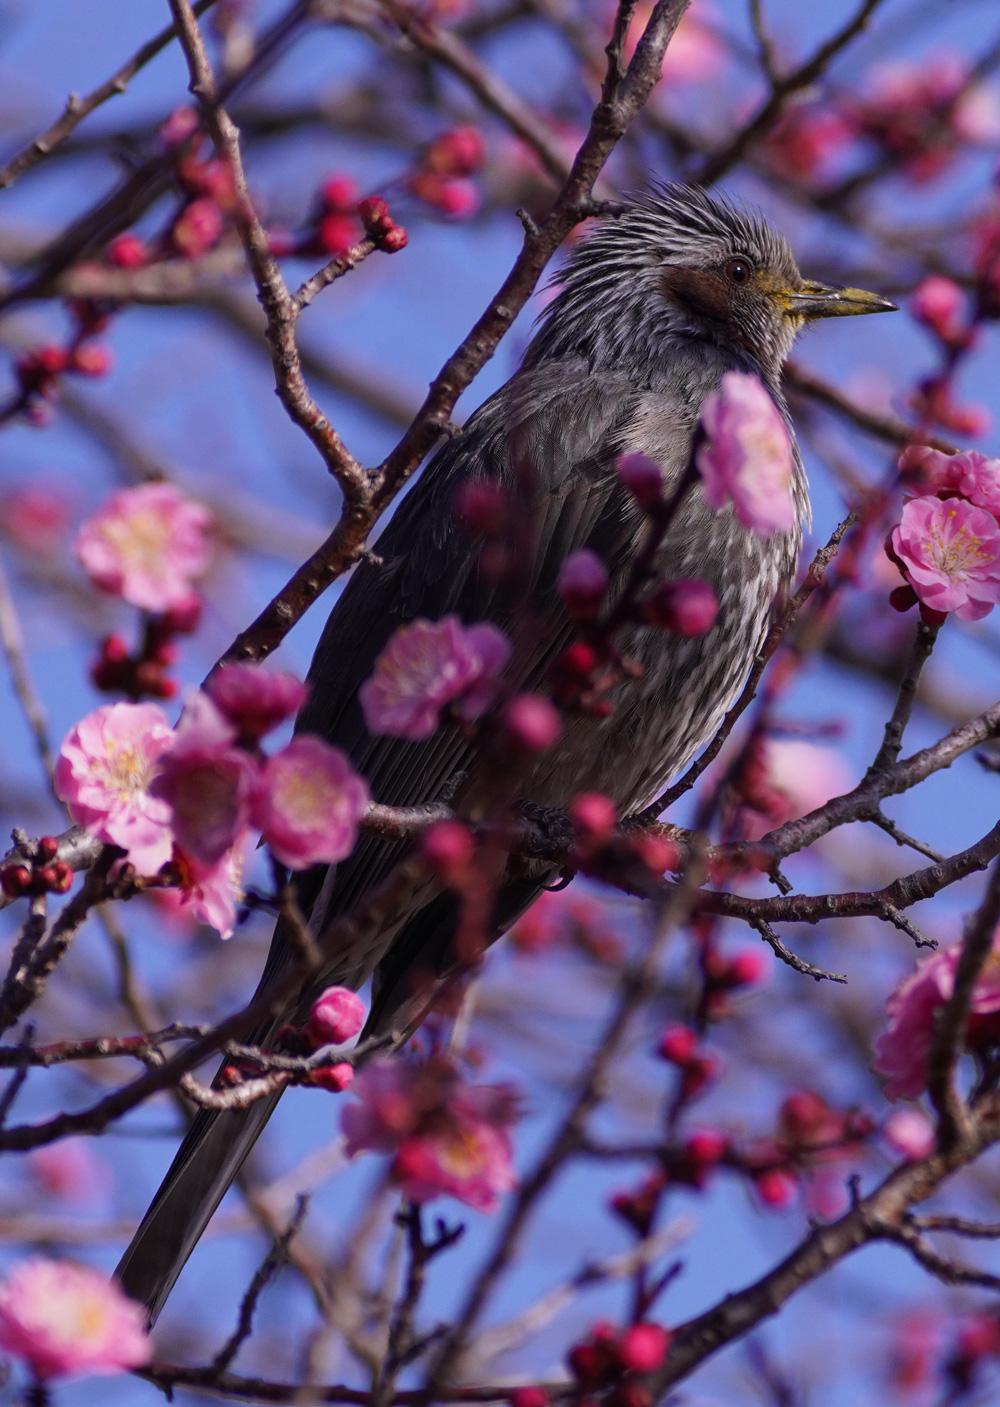 A7R4 野鳥05206_uped1000w